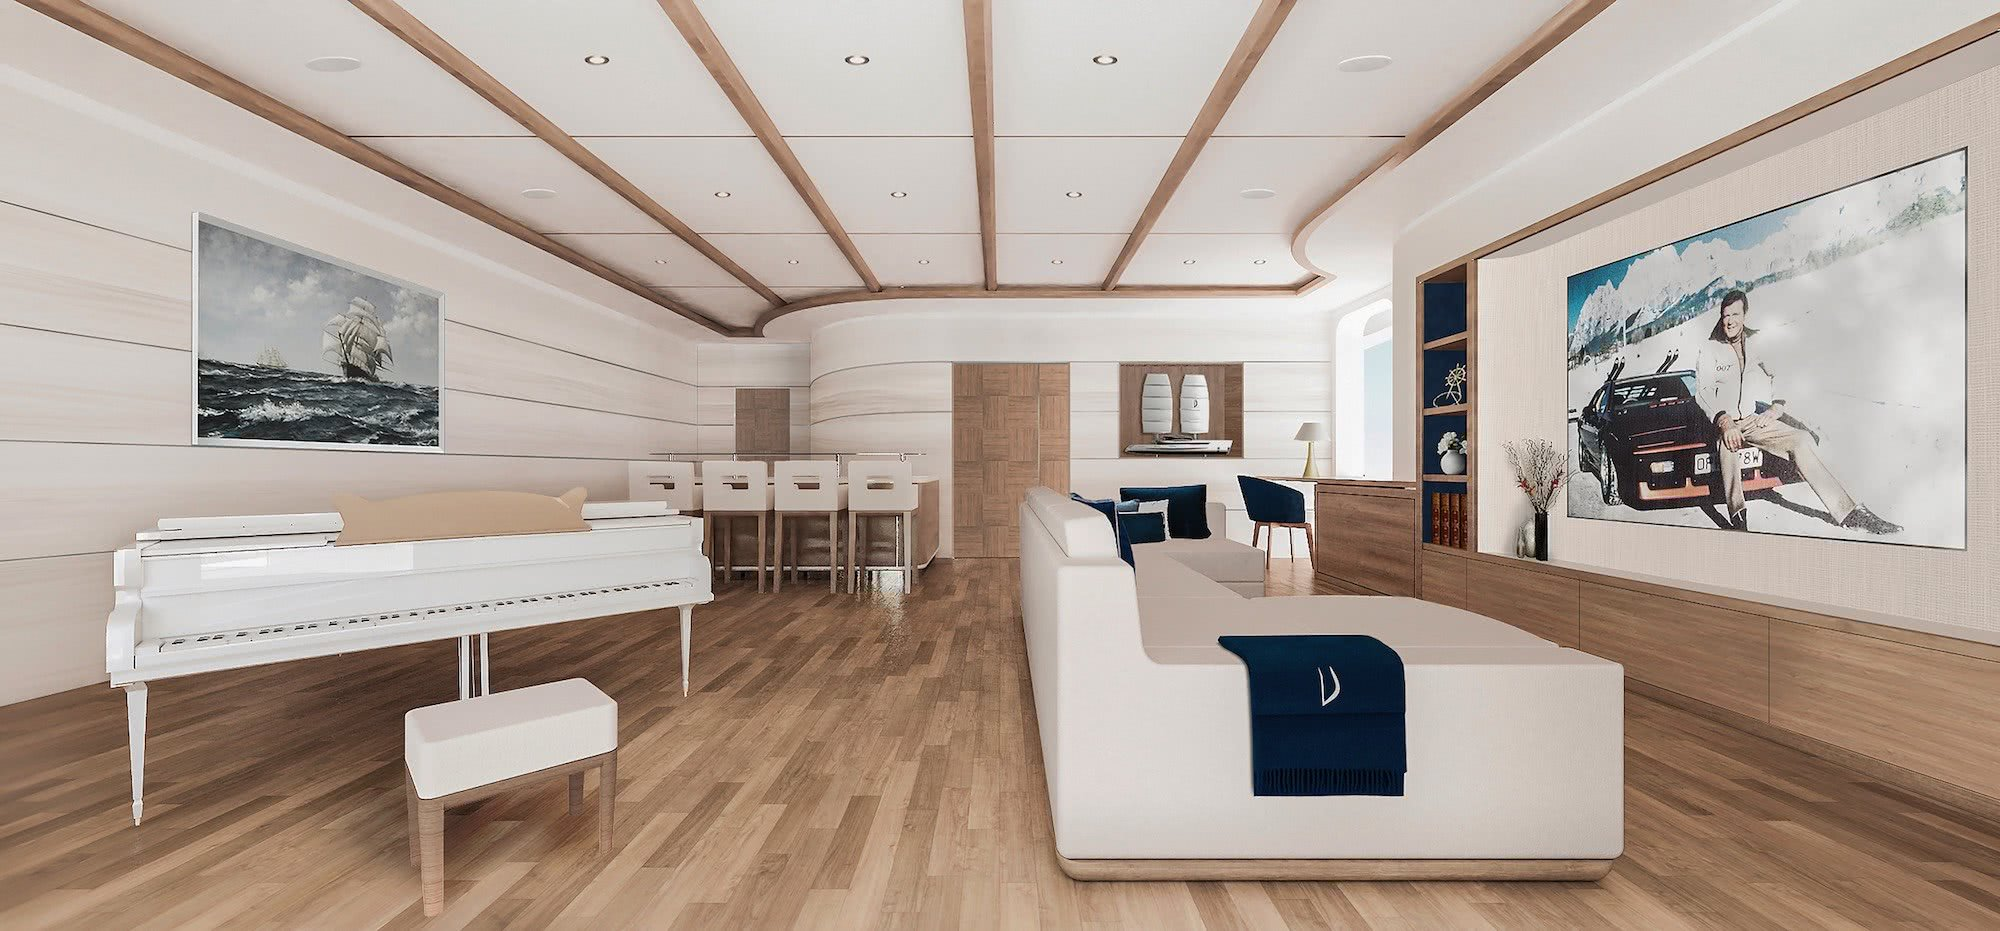 Vela Sailing Yacht Gianmarco Cardia Interior